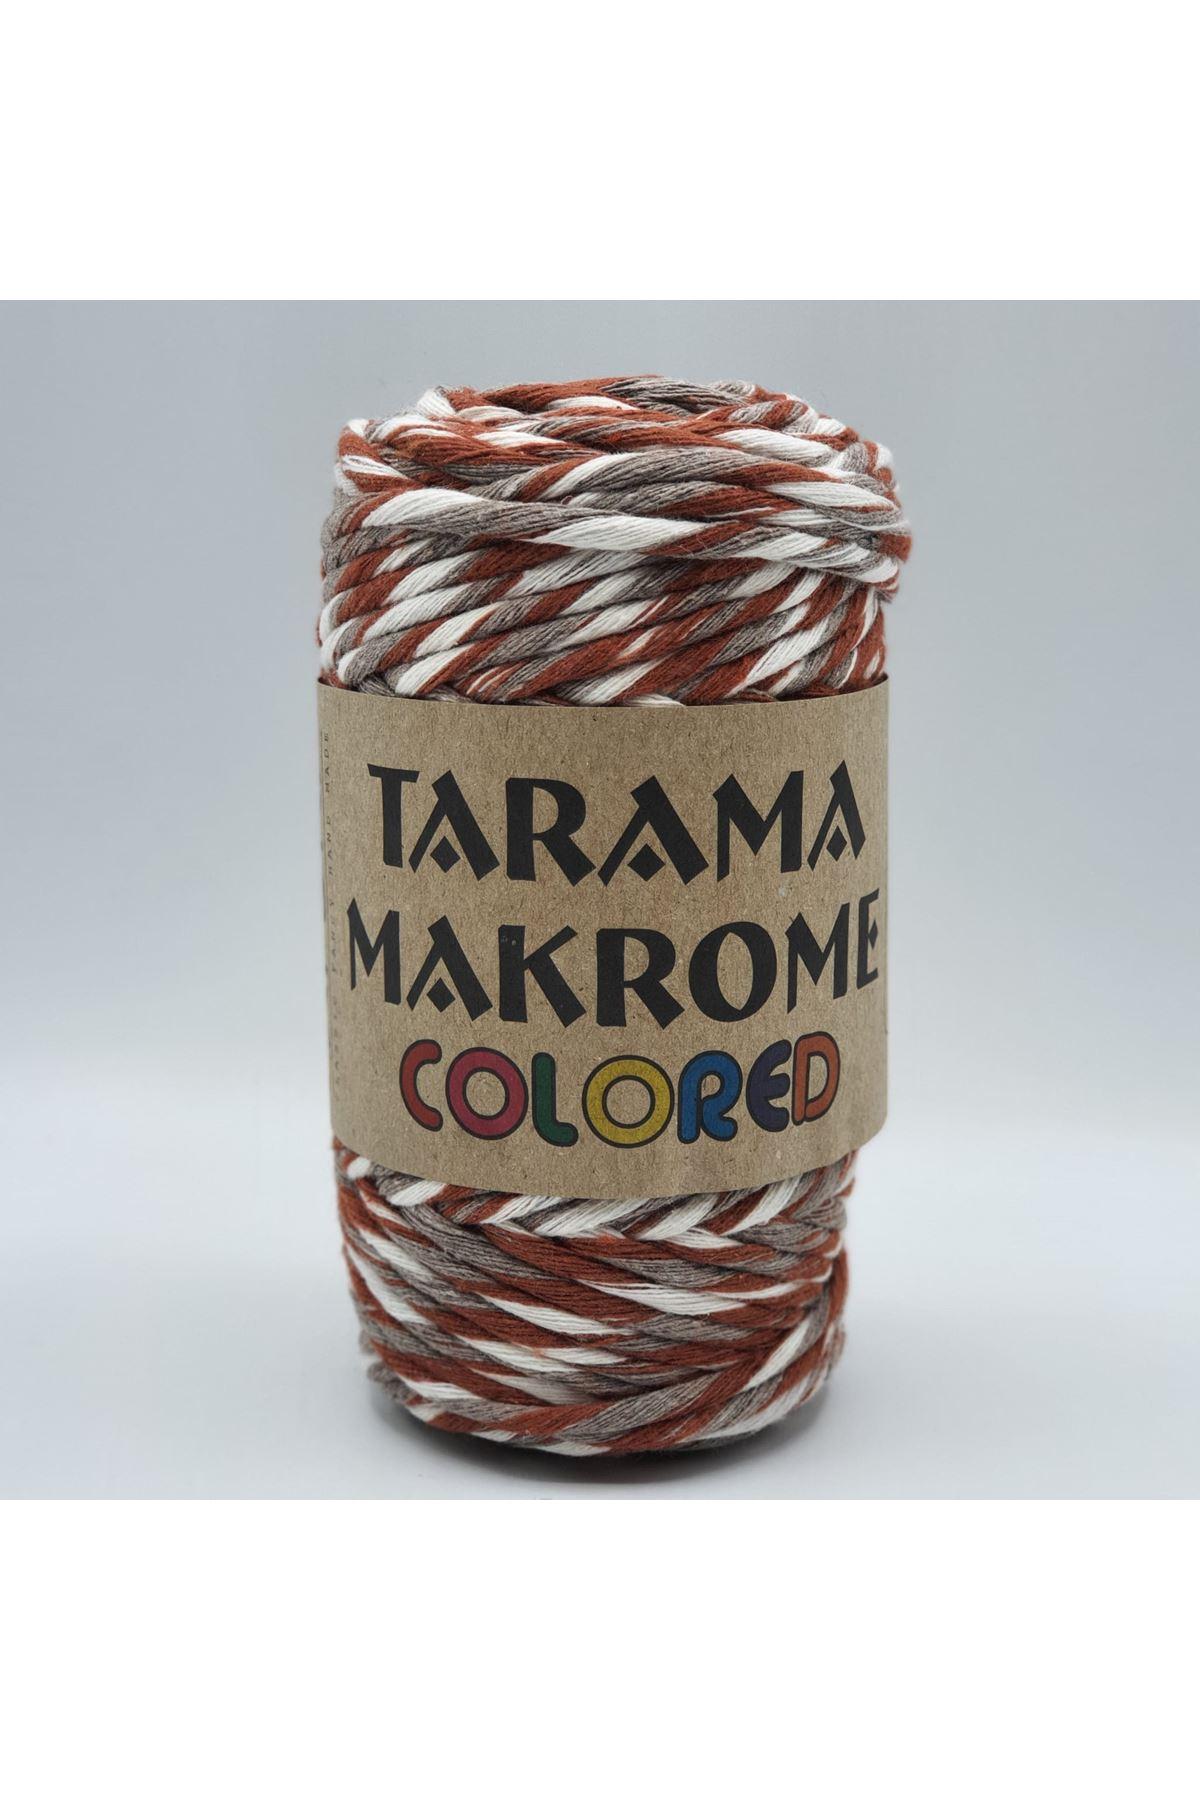 Tarama Makrome Colored 5 mm - 04